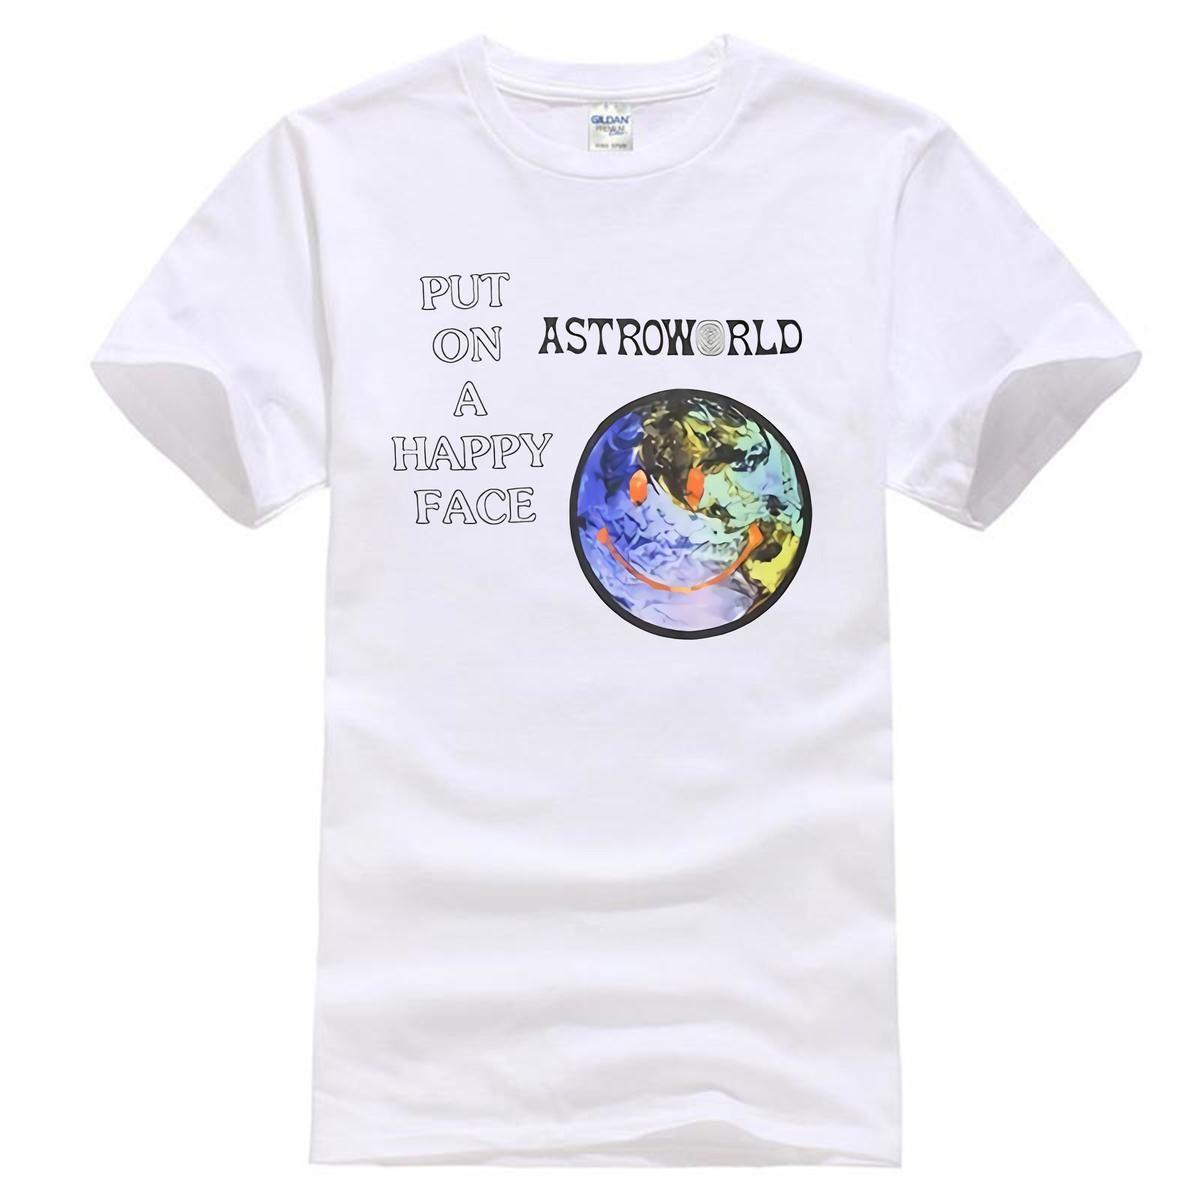 f134b13f ASTROWORLD HAPPY FACE T SHIRT Travis Scott Merch World Face Mens T Shirt  Summer O Neck 100% Cotton Men Short Sleeve Tee Funny Graphic T Shirts Funny  T ...